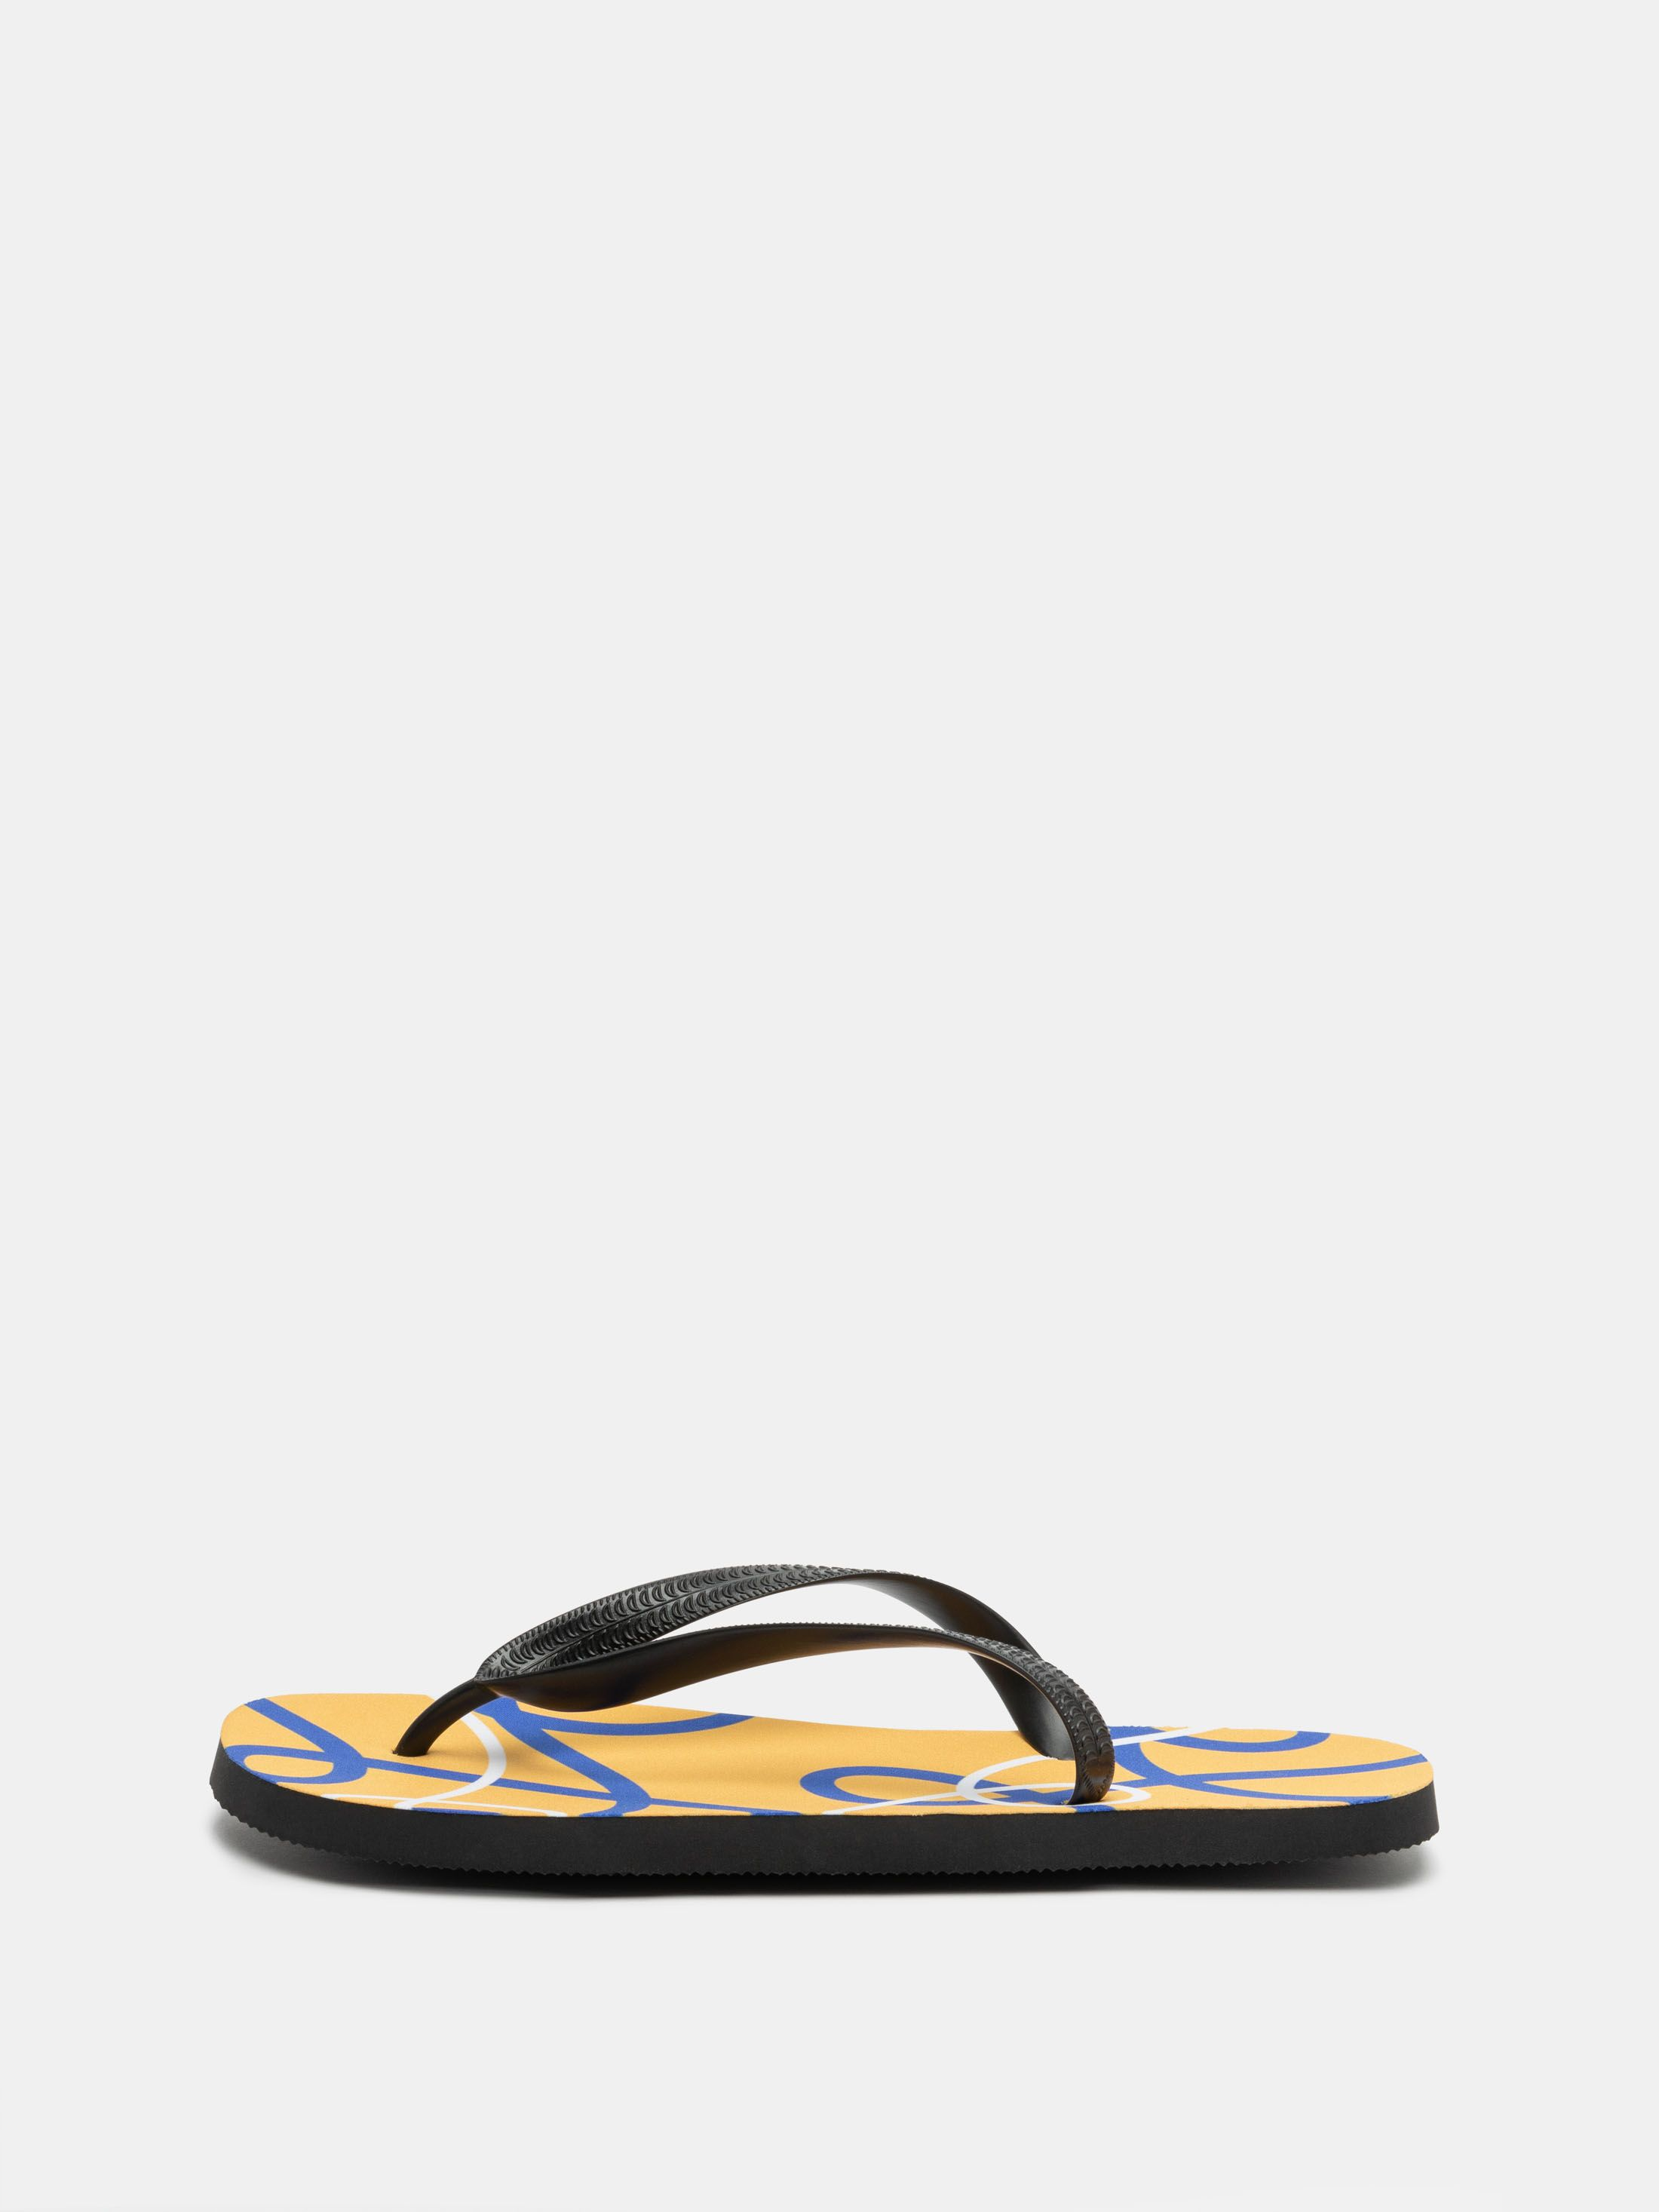 Personaliza sandalias originales online